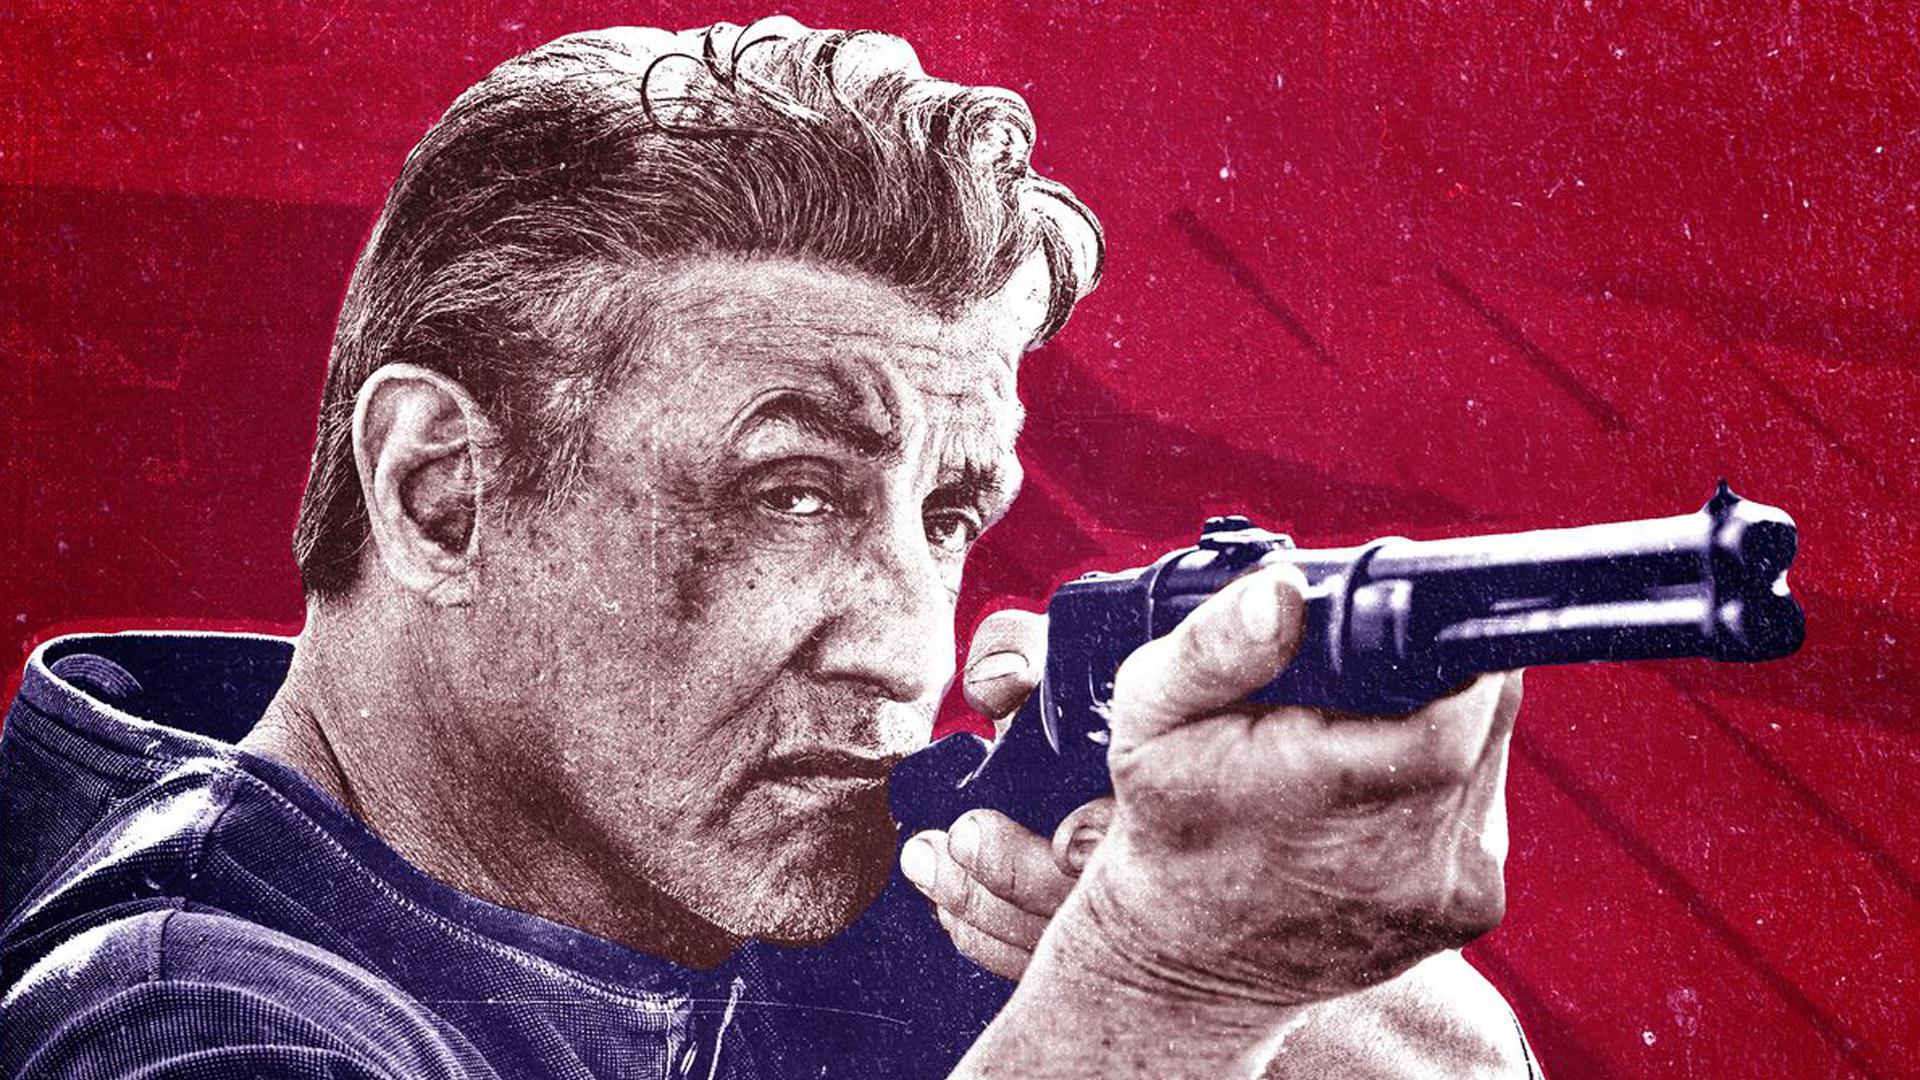 Rambo : Last Blood artwork